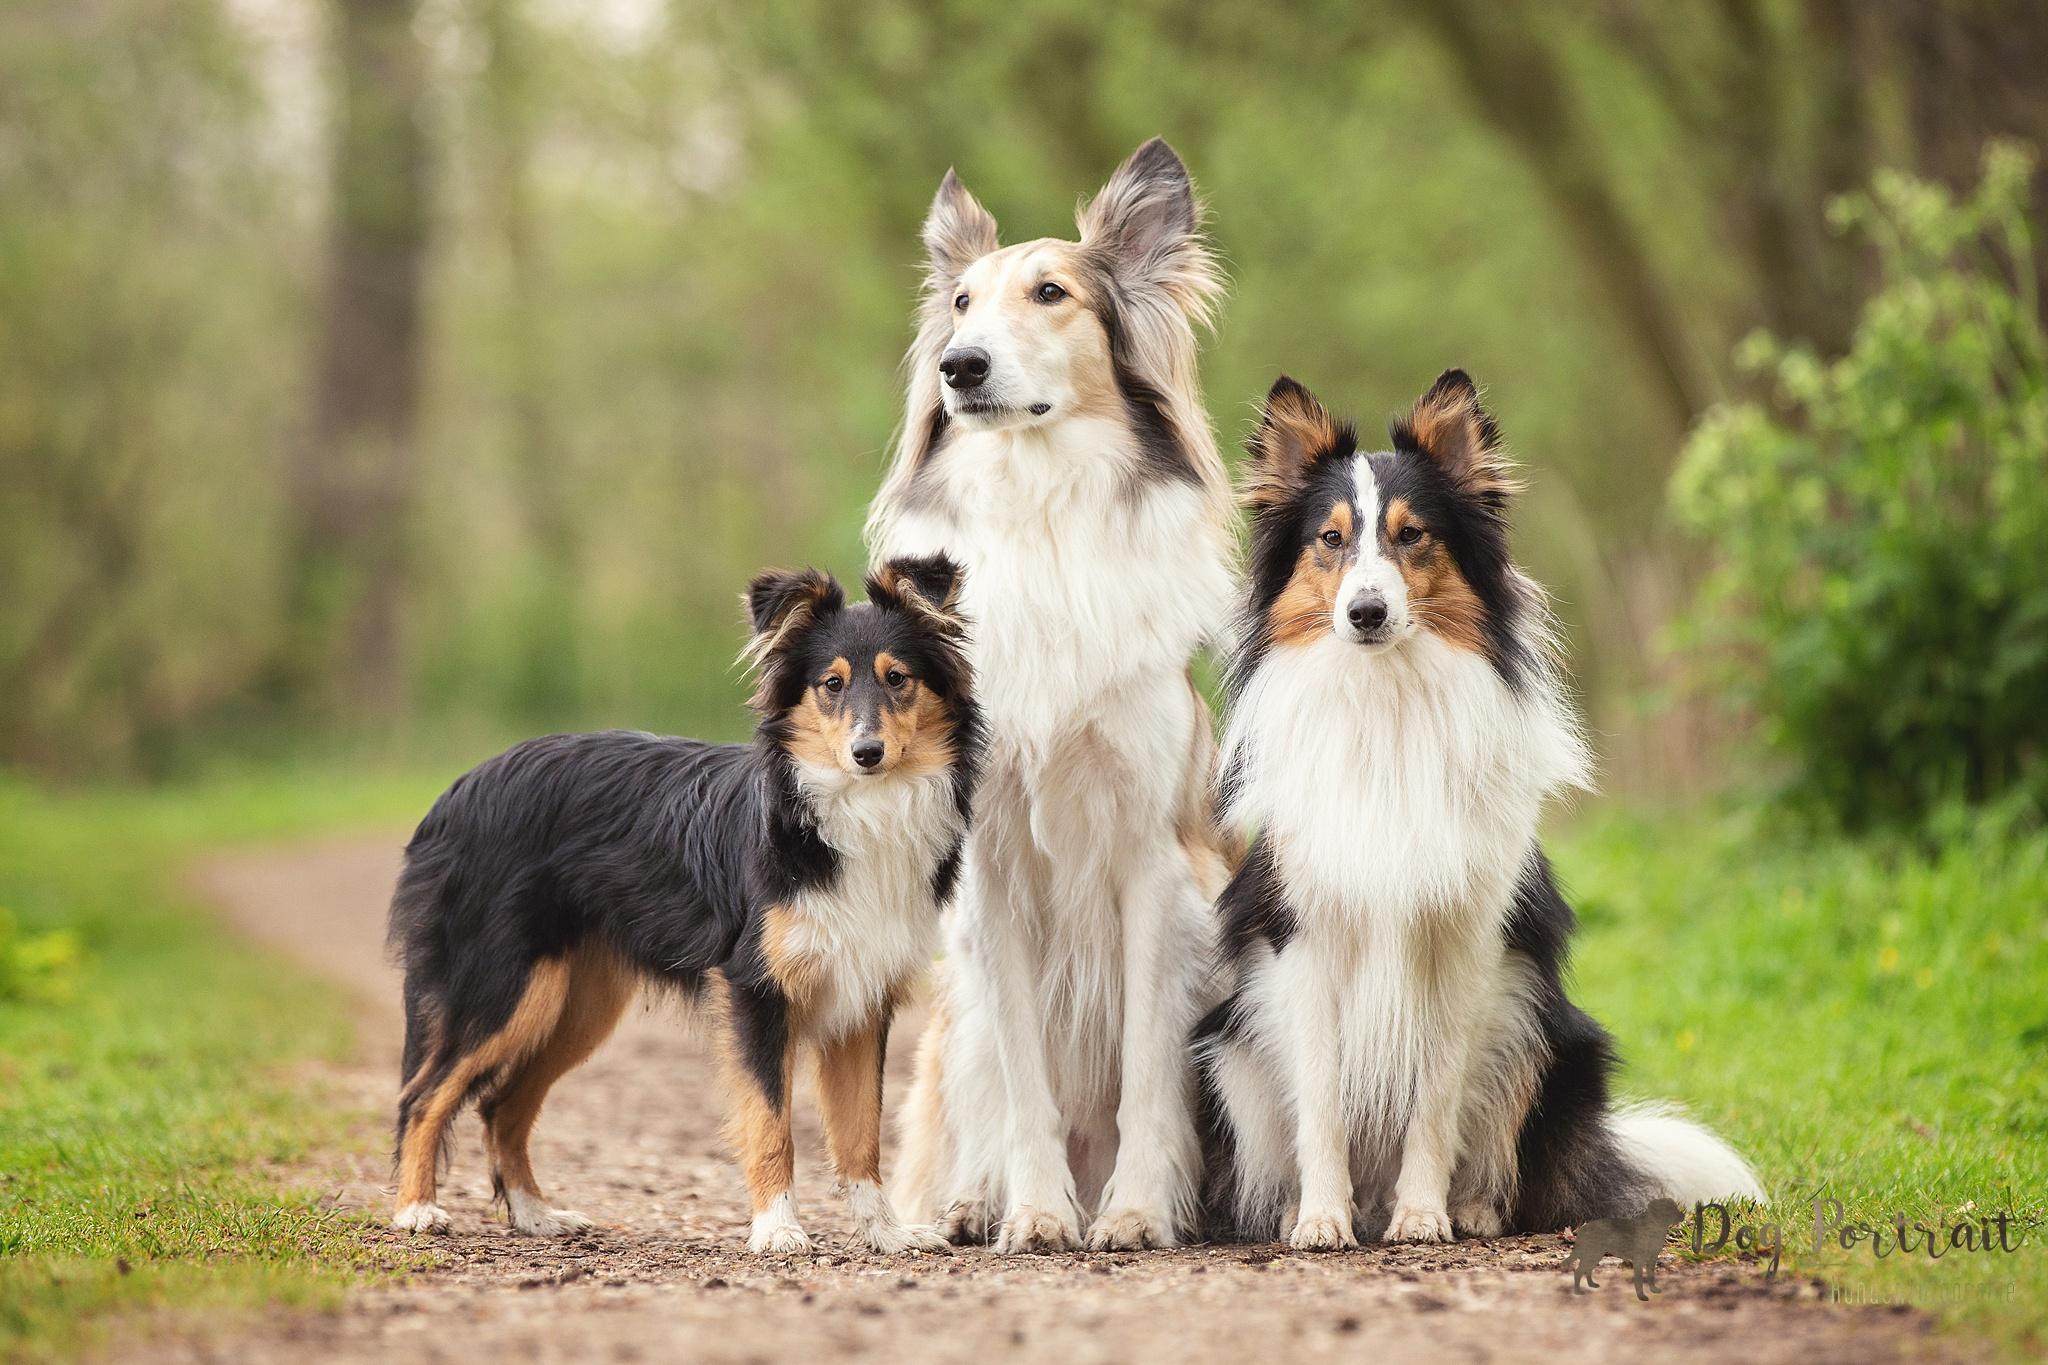 Hondenfotograaf Waddinxveen - Groei mee serie Puk